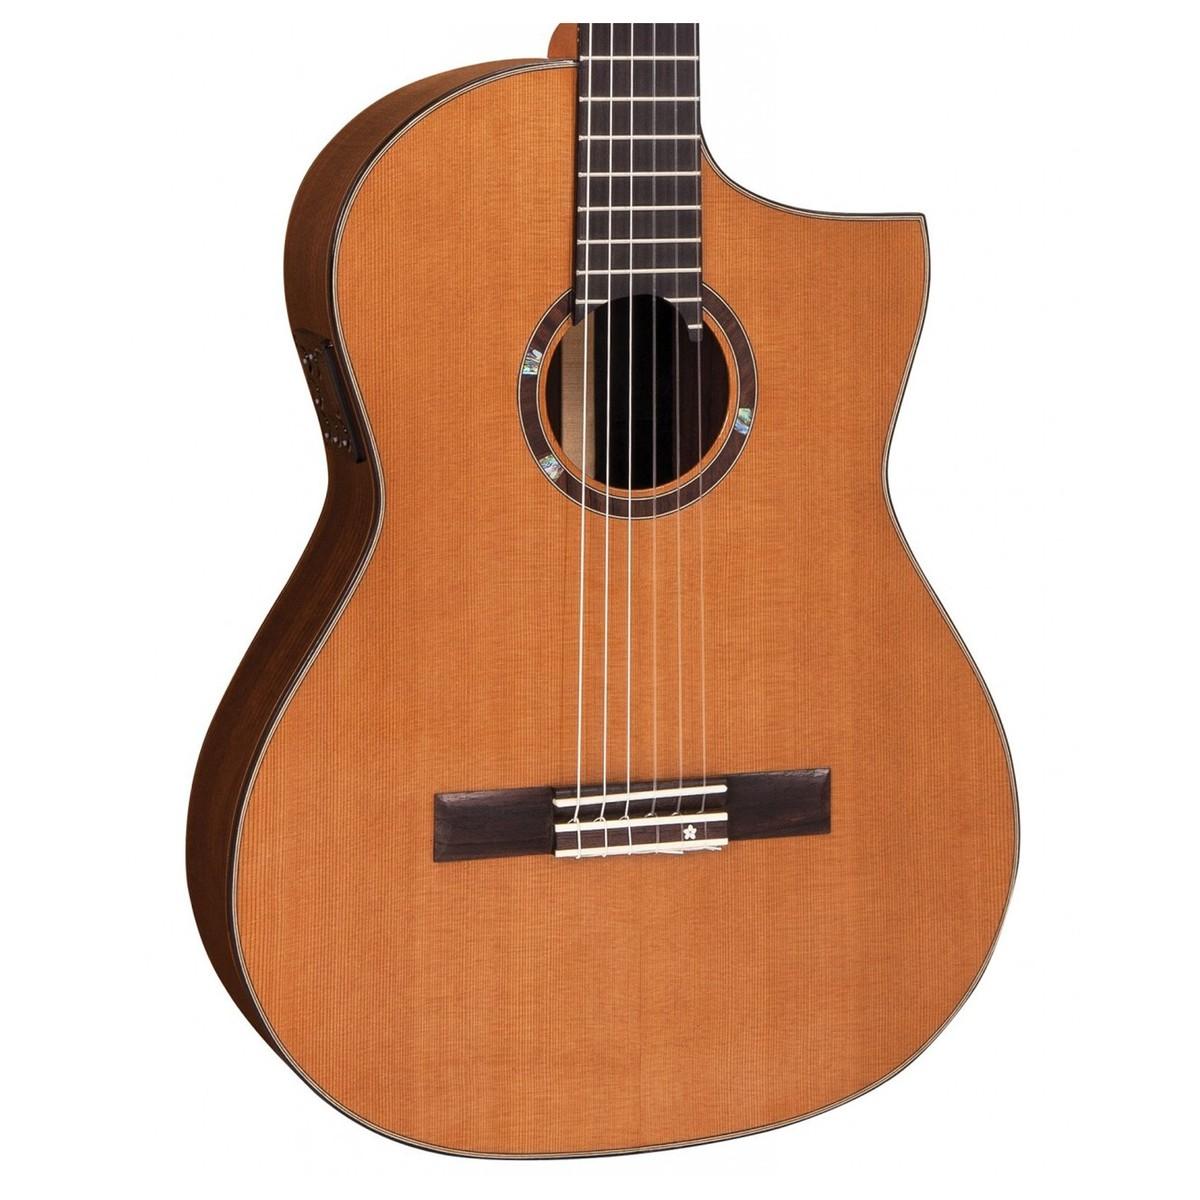 vintage roger williams nylon electro acoustic crossover guitar at. Black Bedroom Furniture Sets. Home Design Ideas